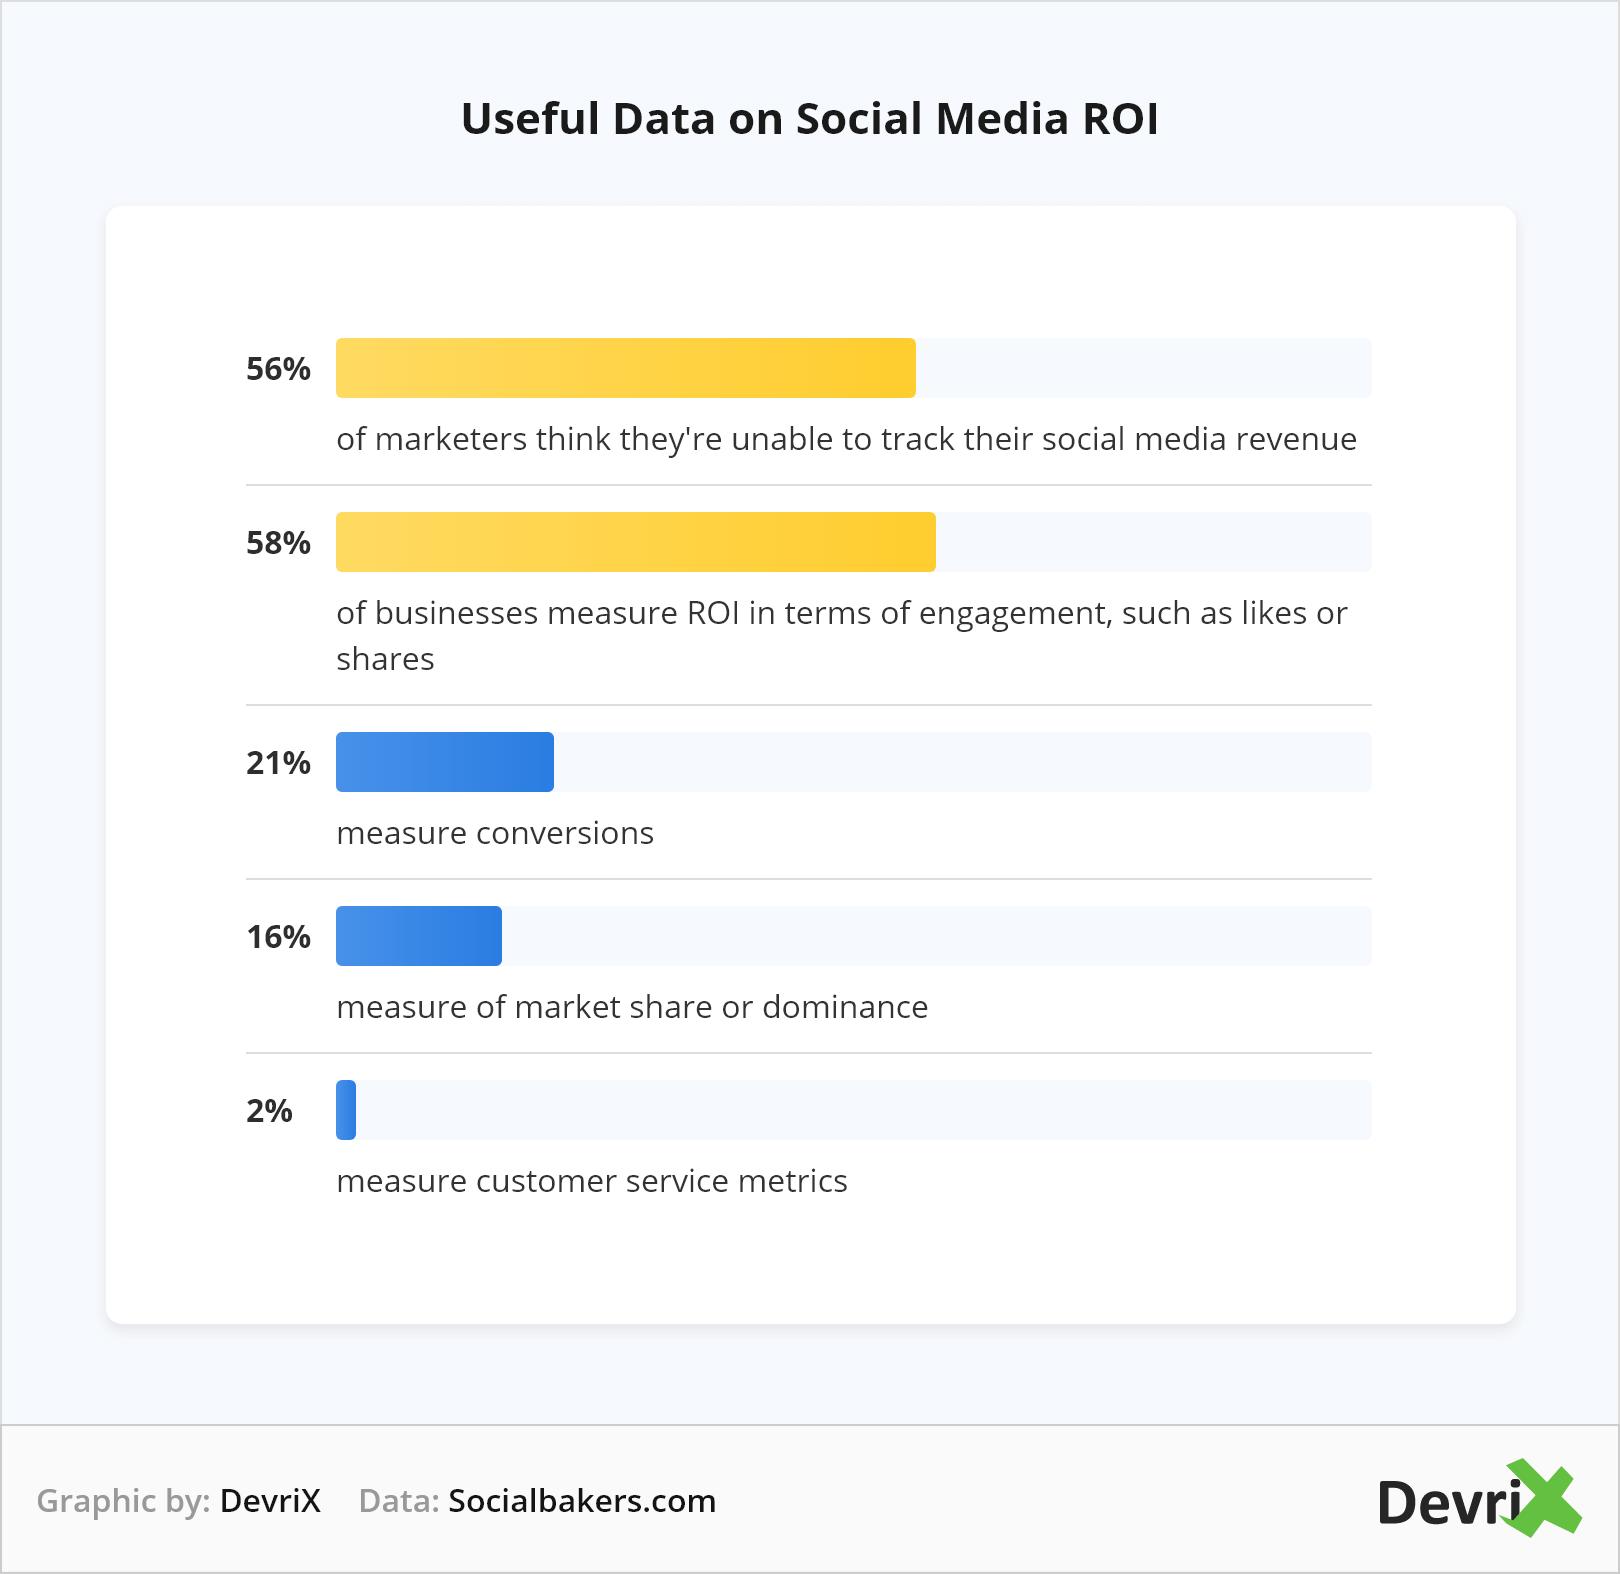 useful data on social media roi